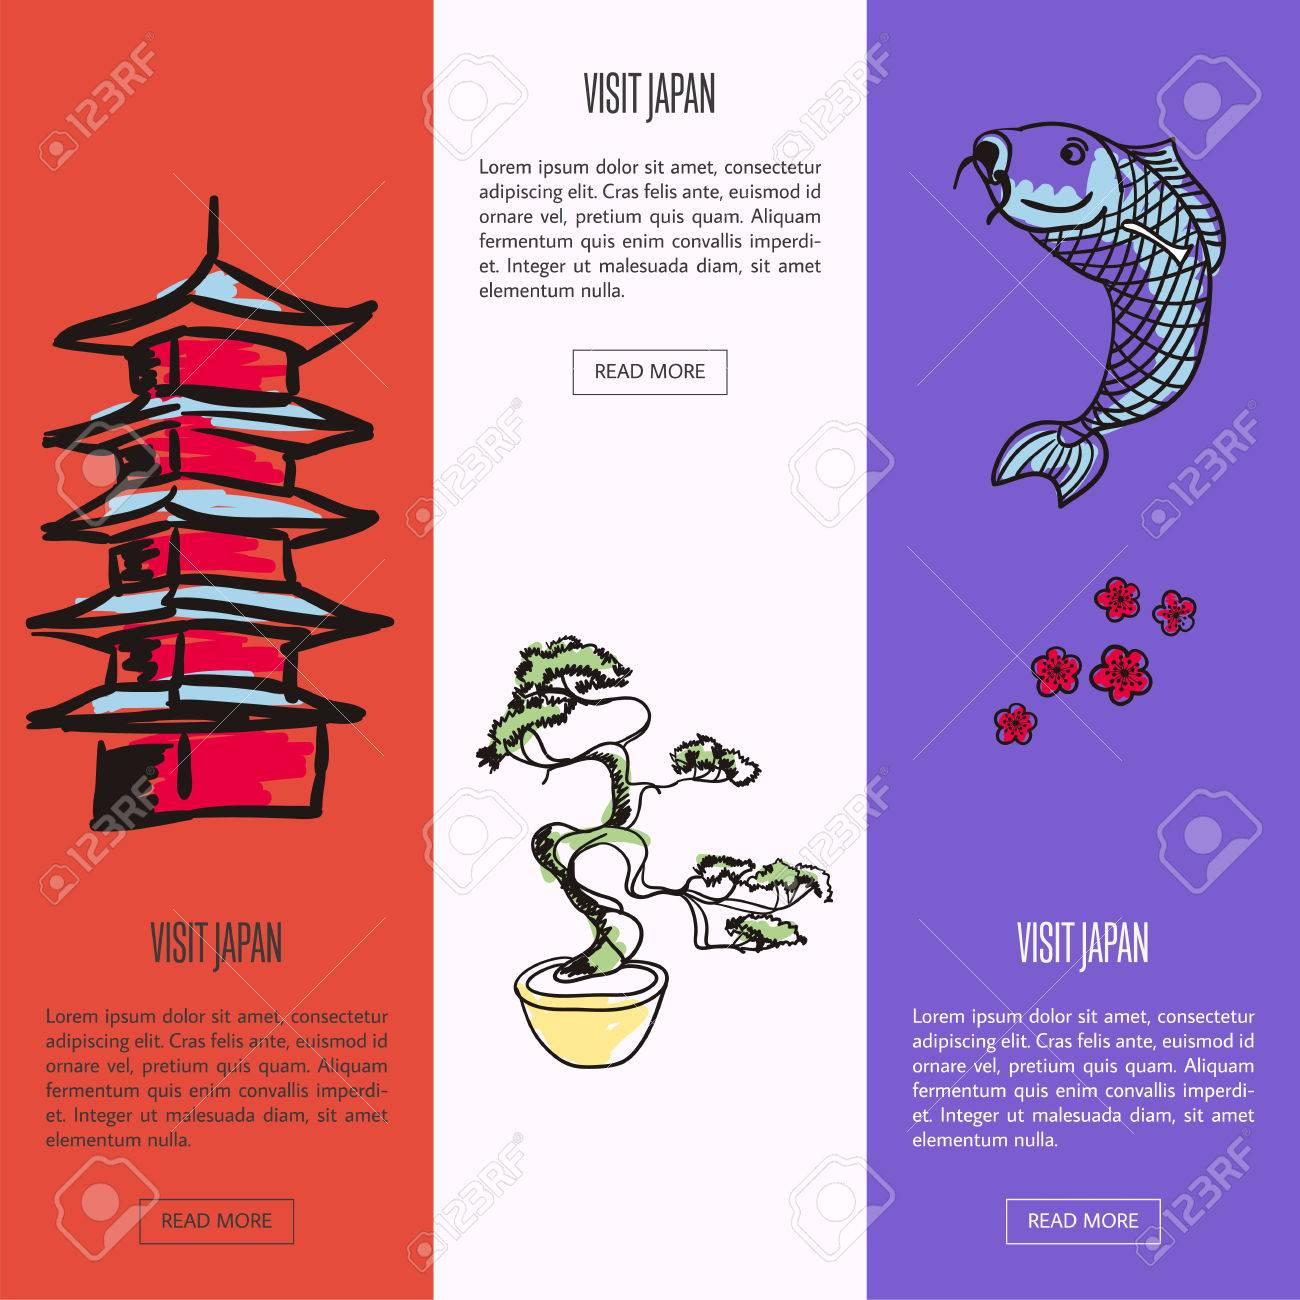 Visit Japan Vertical Web Banners. Koi Fish, Sakura Cherry Flowers ...